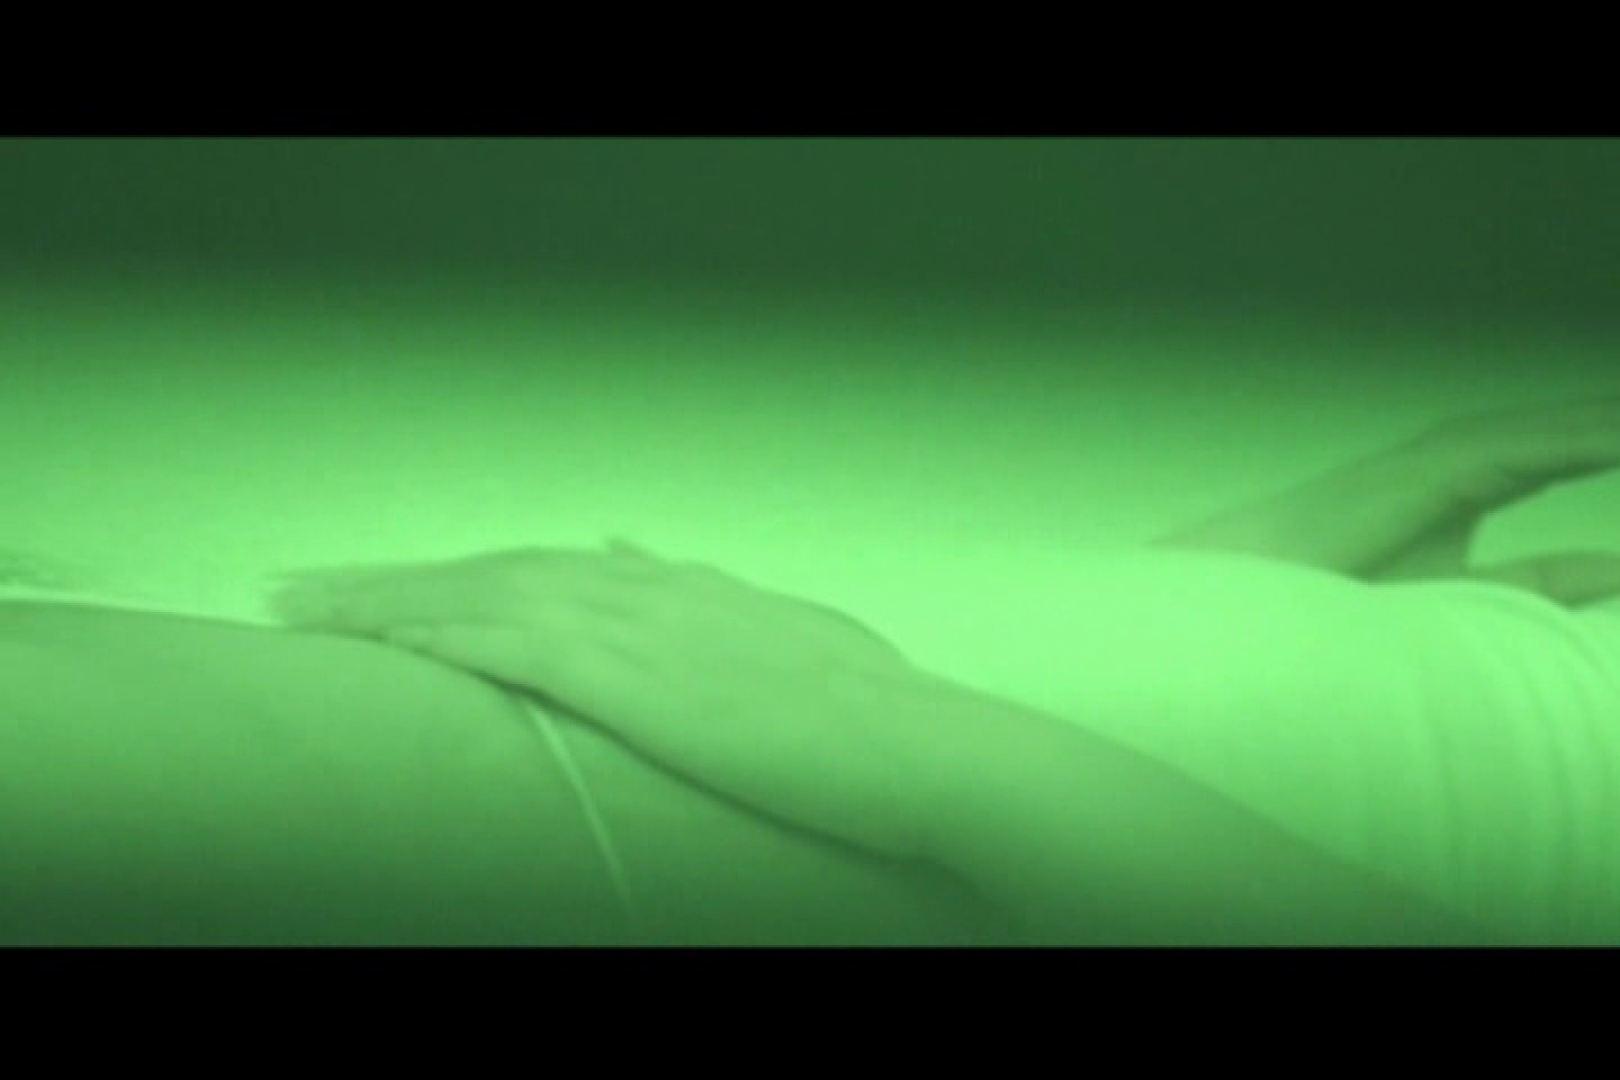 独占配信!無修正! 看護女子寮 vol.12 ナースのエロ動画 SEX無修正画像 78PIX 71